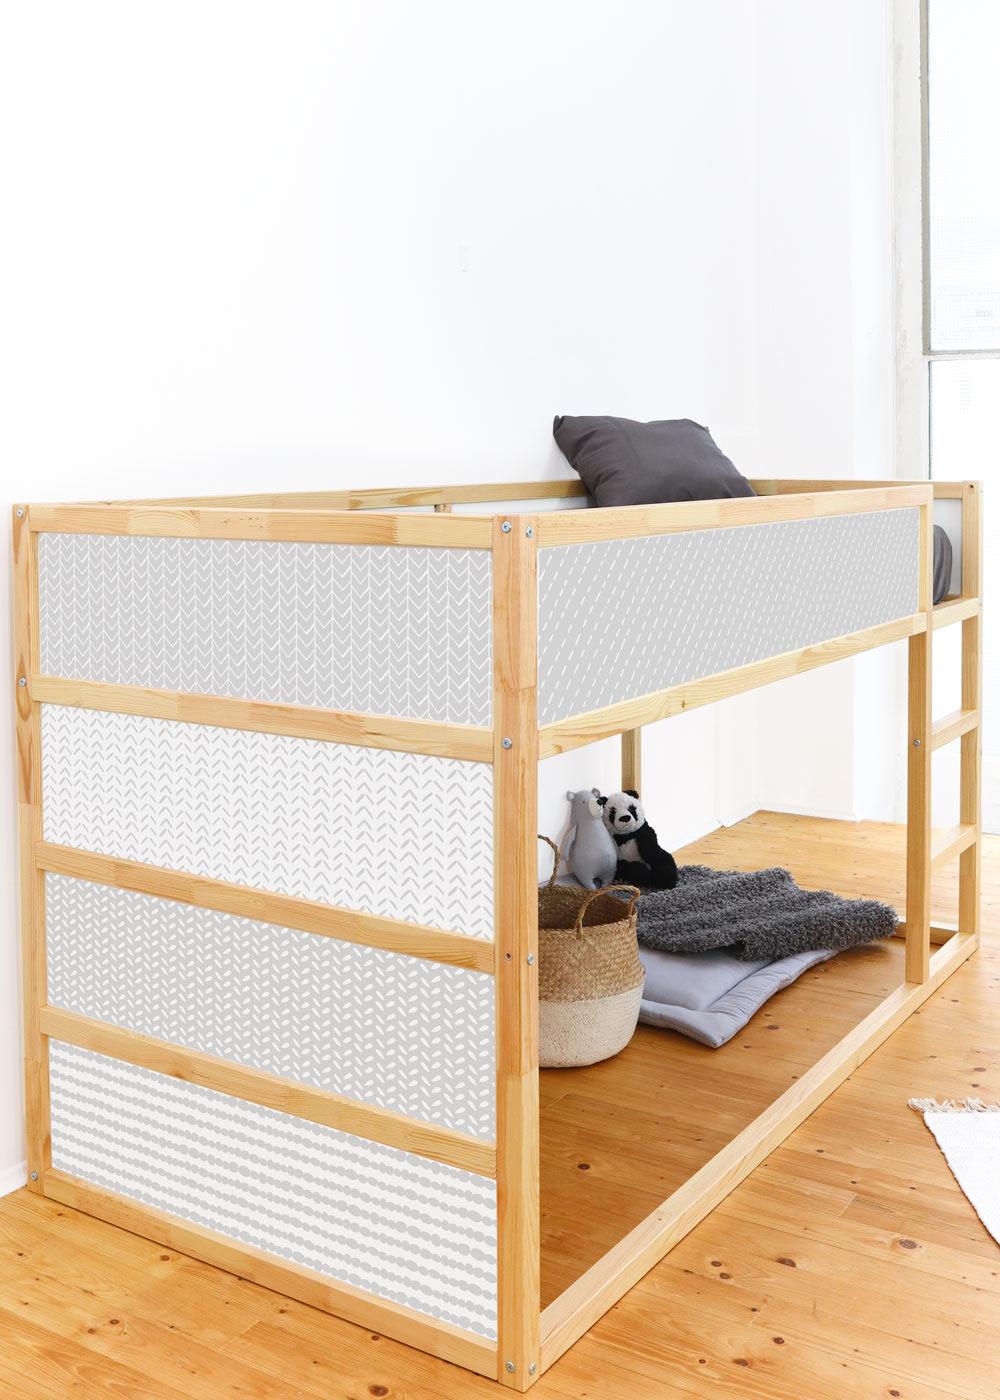 Ikea Kuras Hochbett Musta hellgrau Seitenansicht